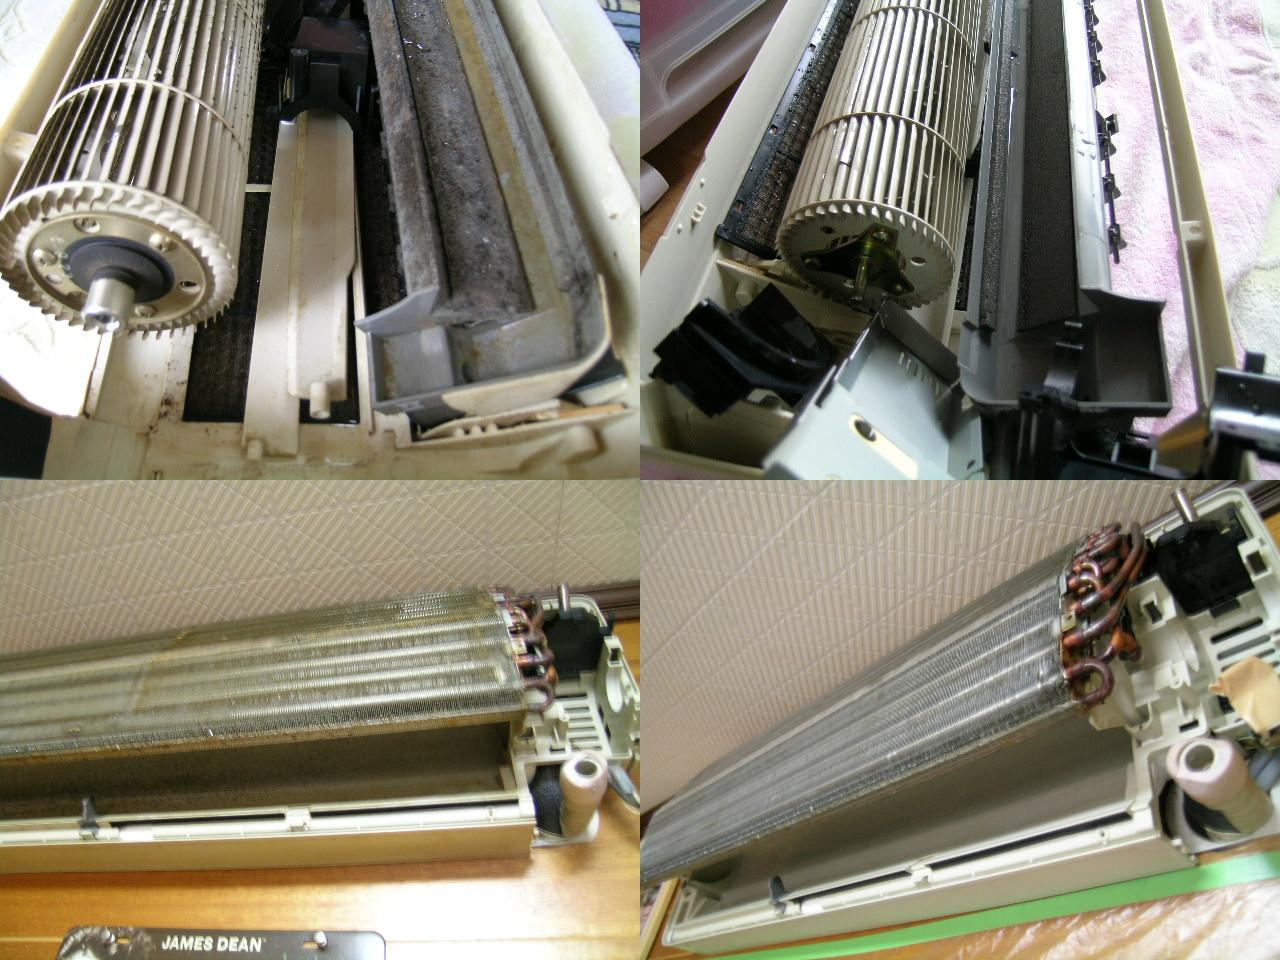 http://ajras.net/images/100709b-parts.jpg